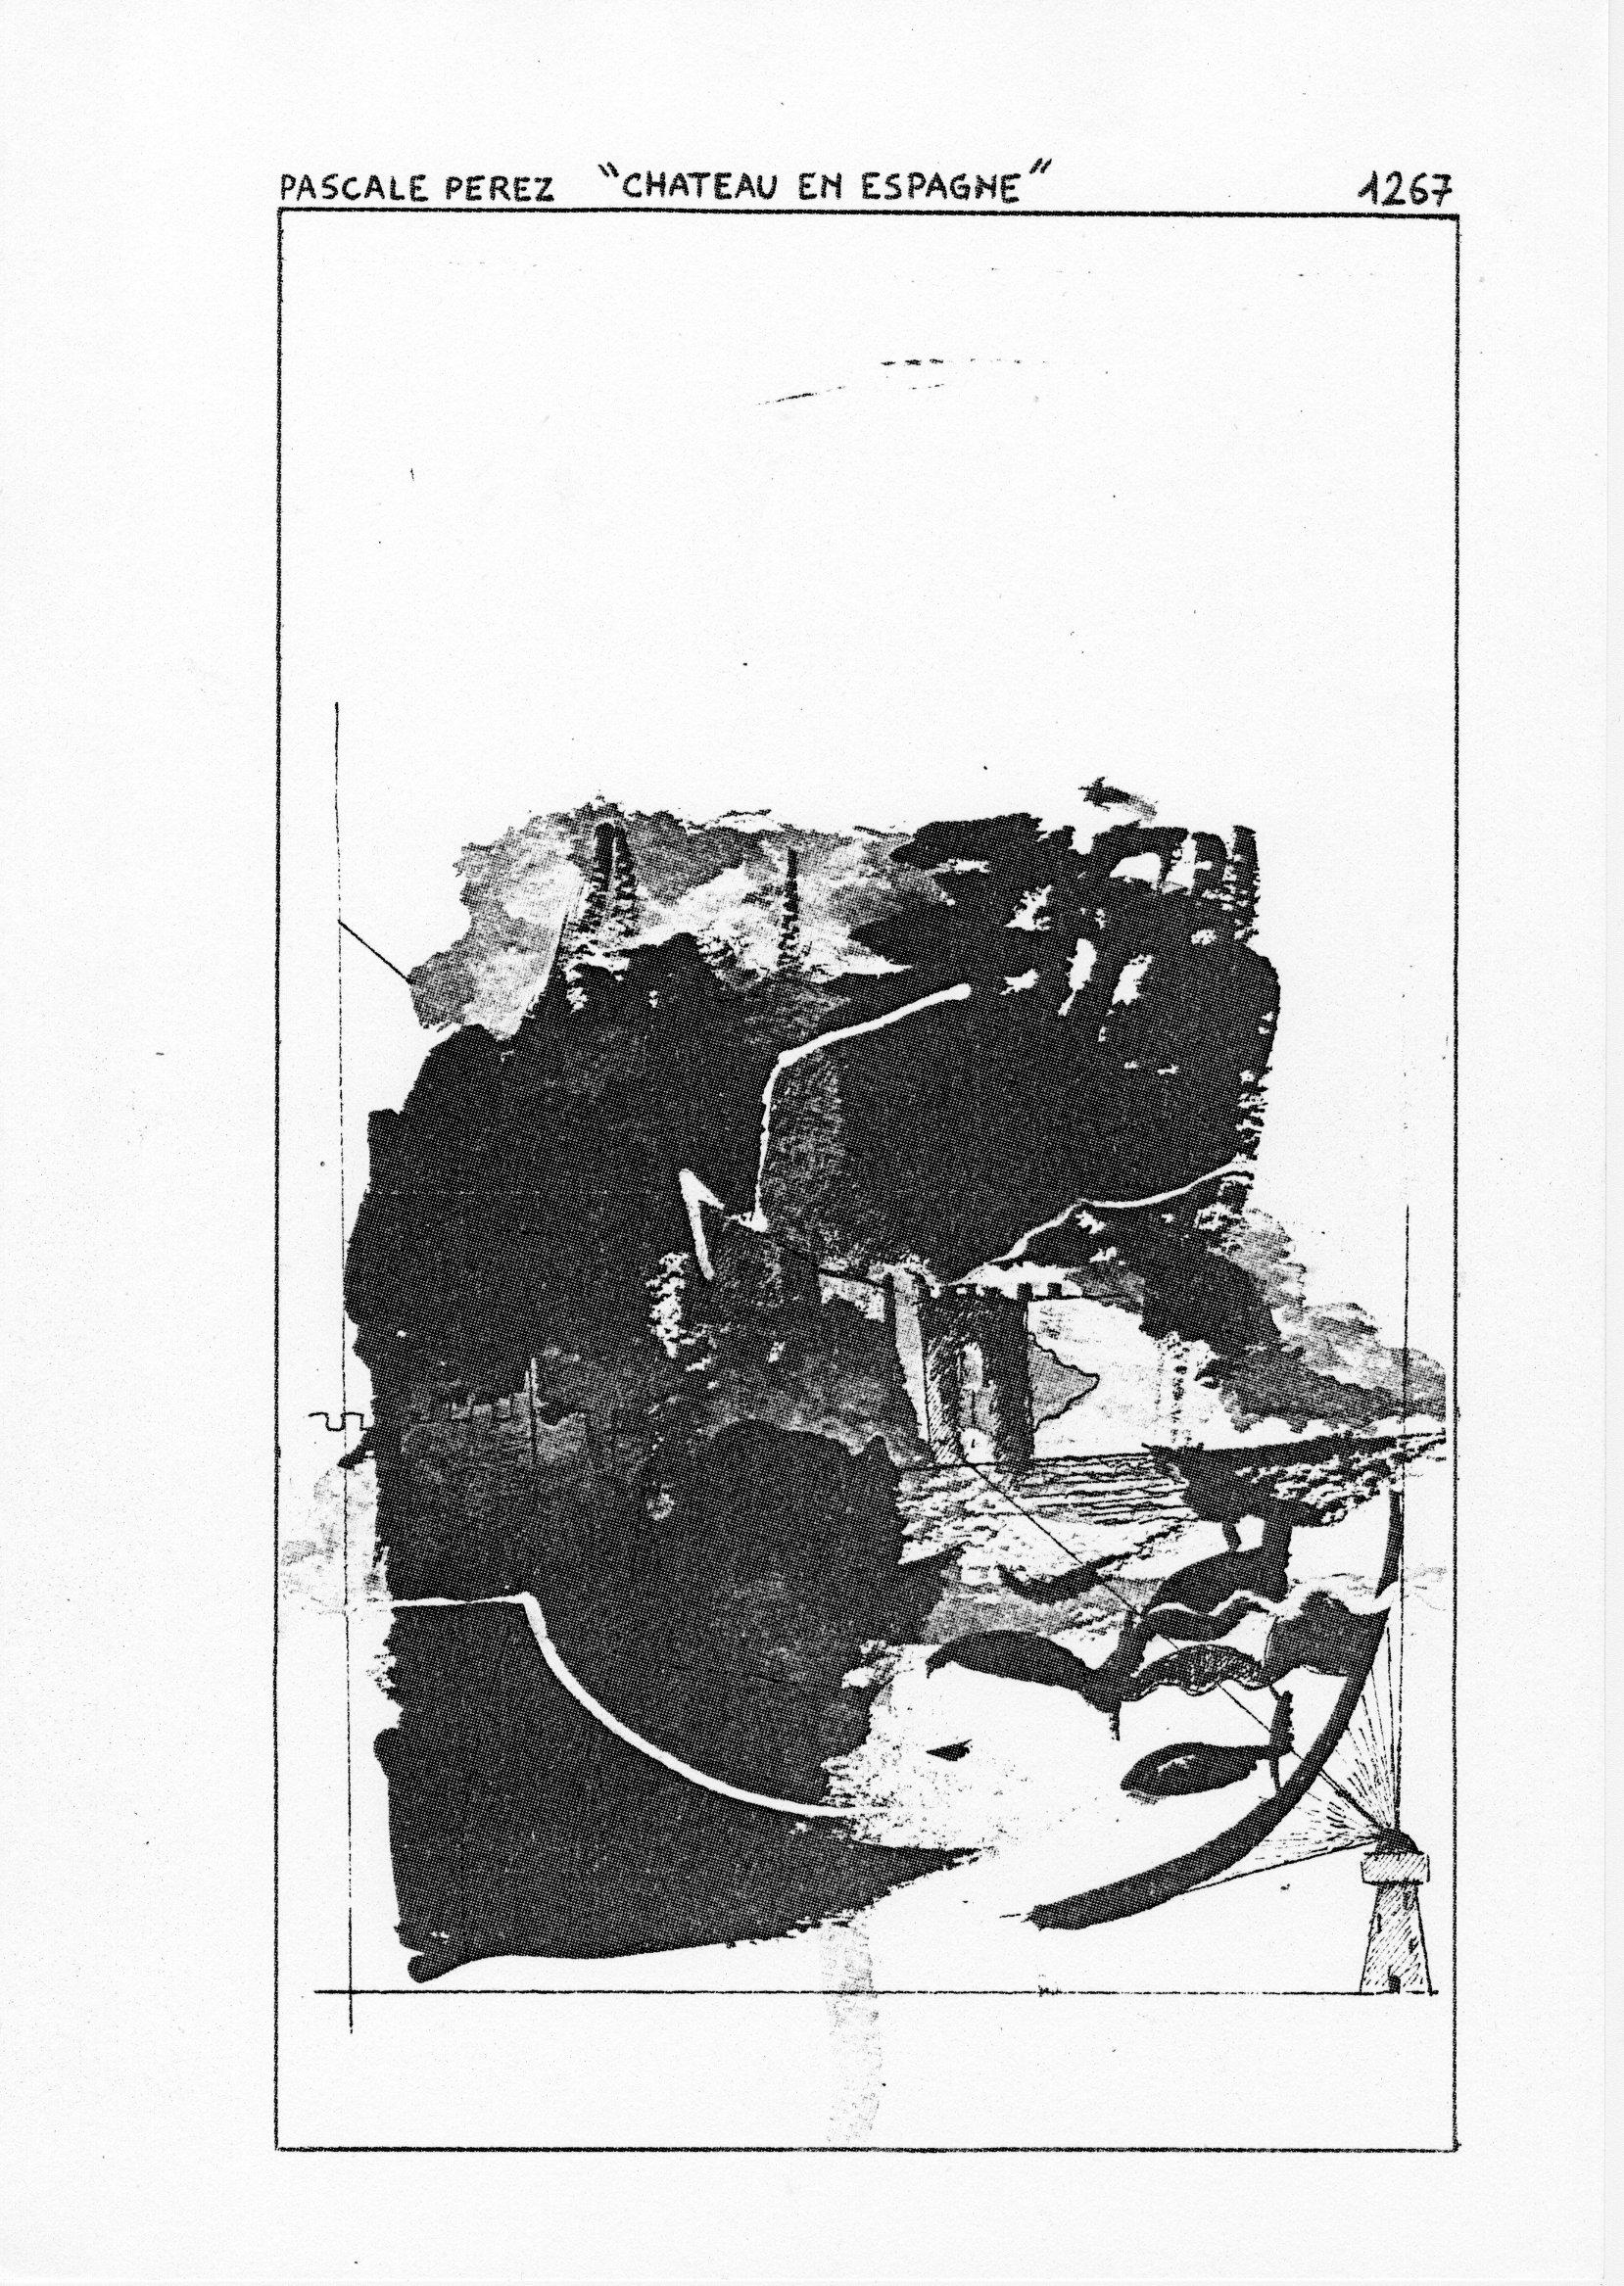 page 1267 P. PEREZ CHATEAU EN ESPAGNE